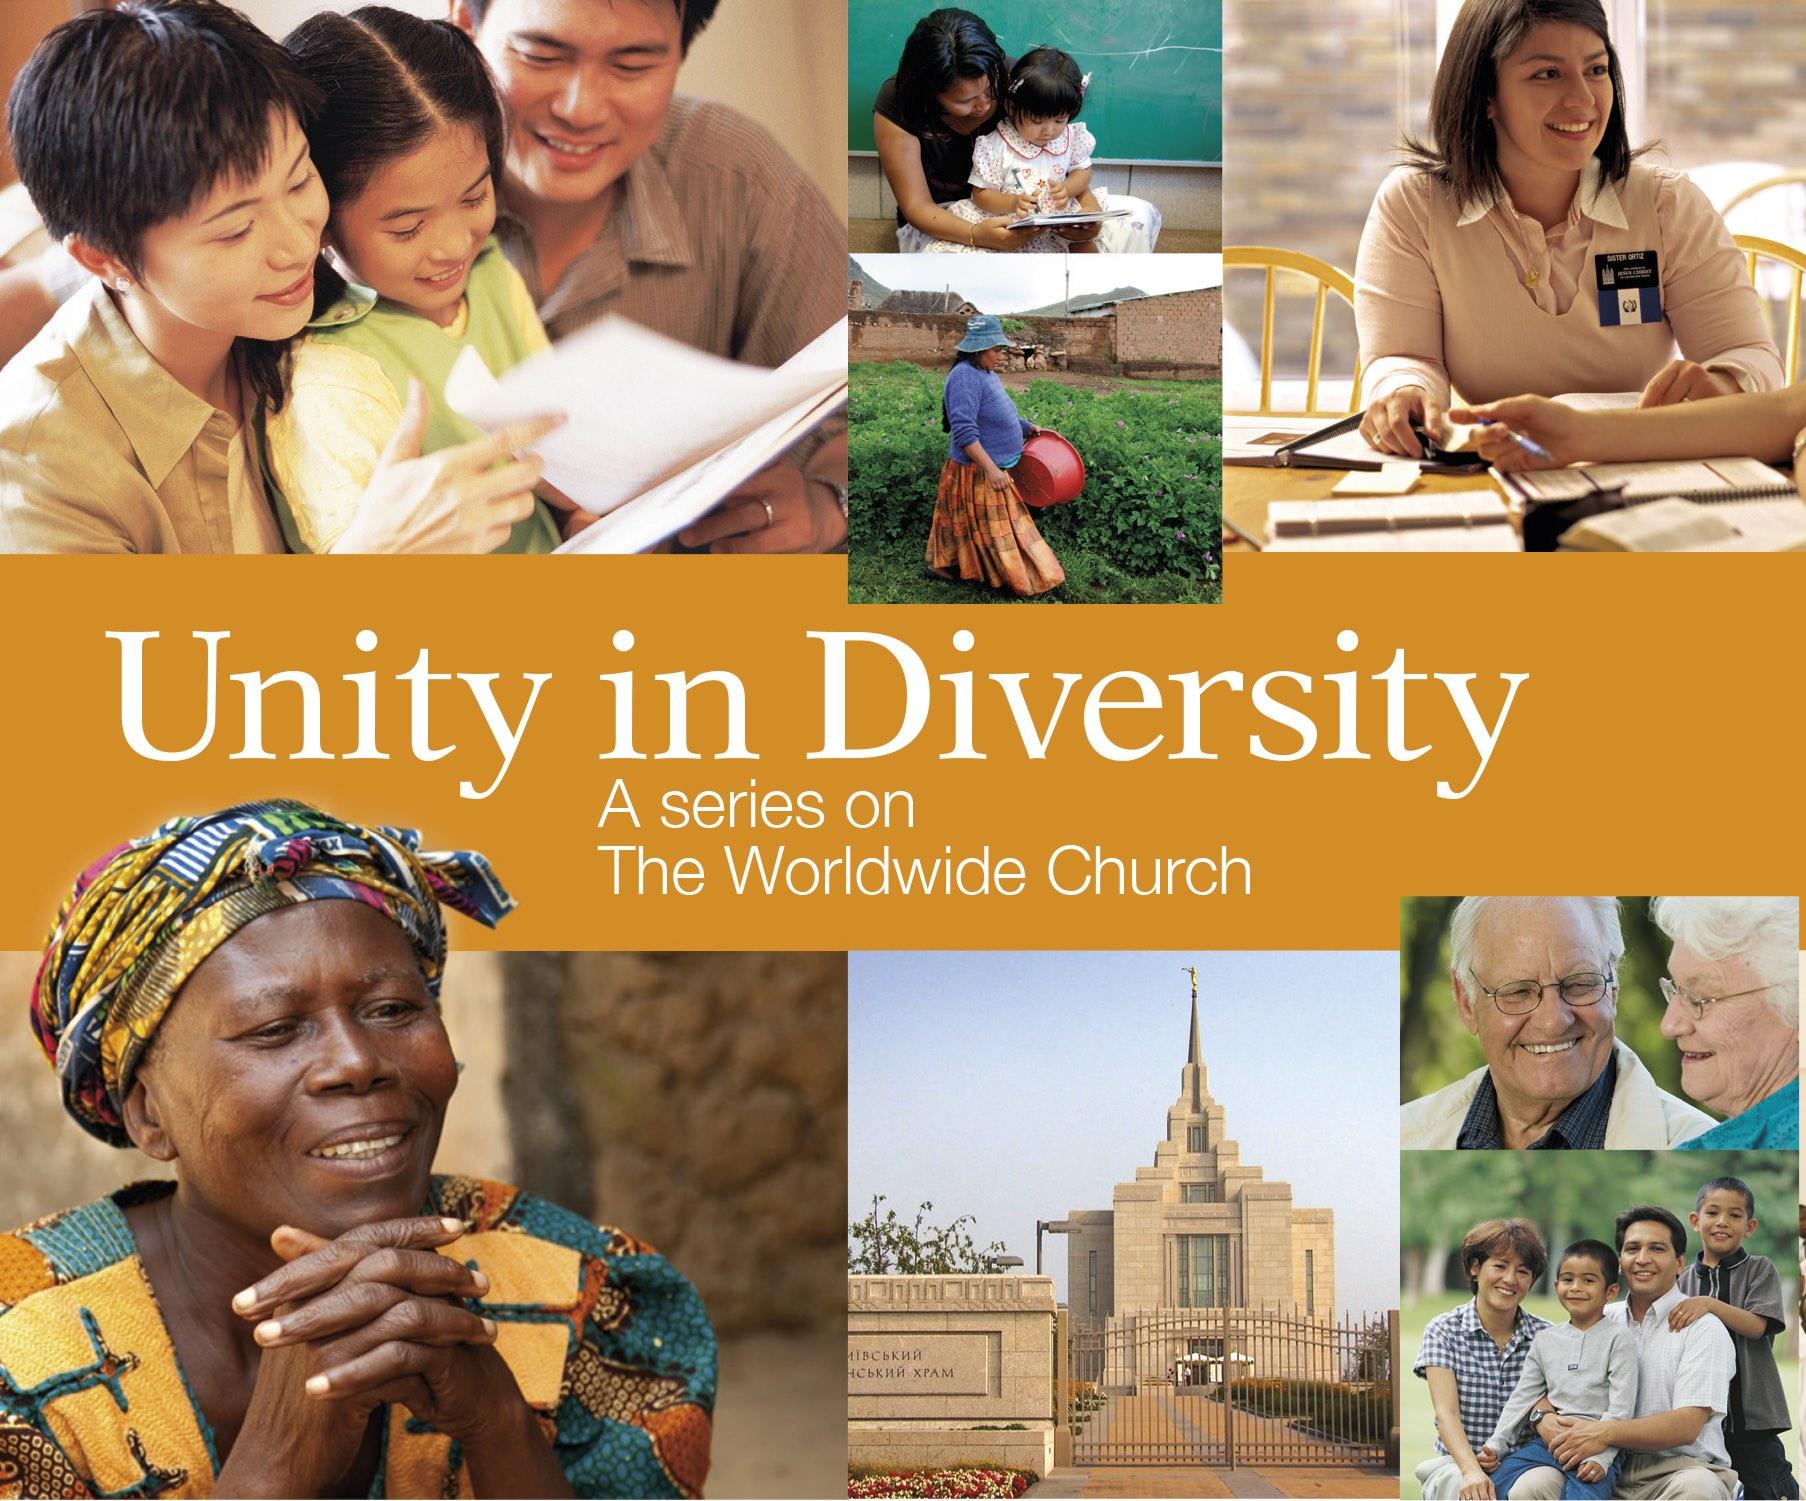 unity-in-diversity-3-otakada.org